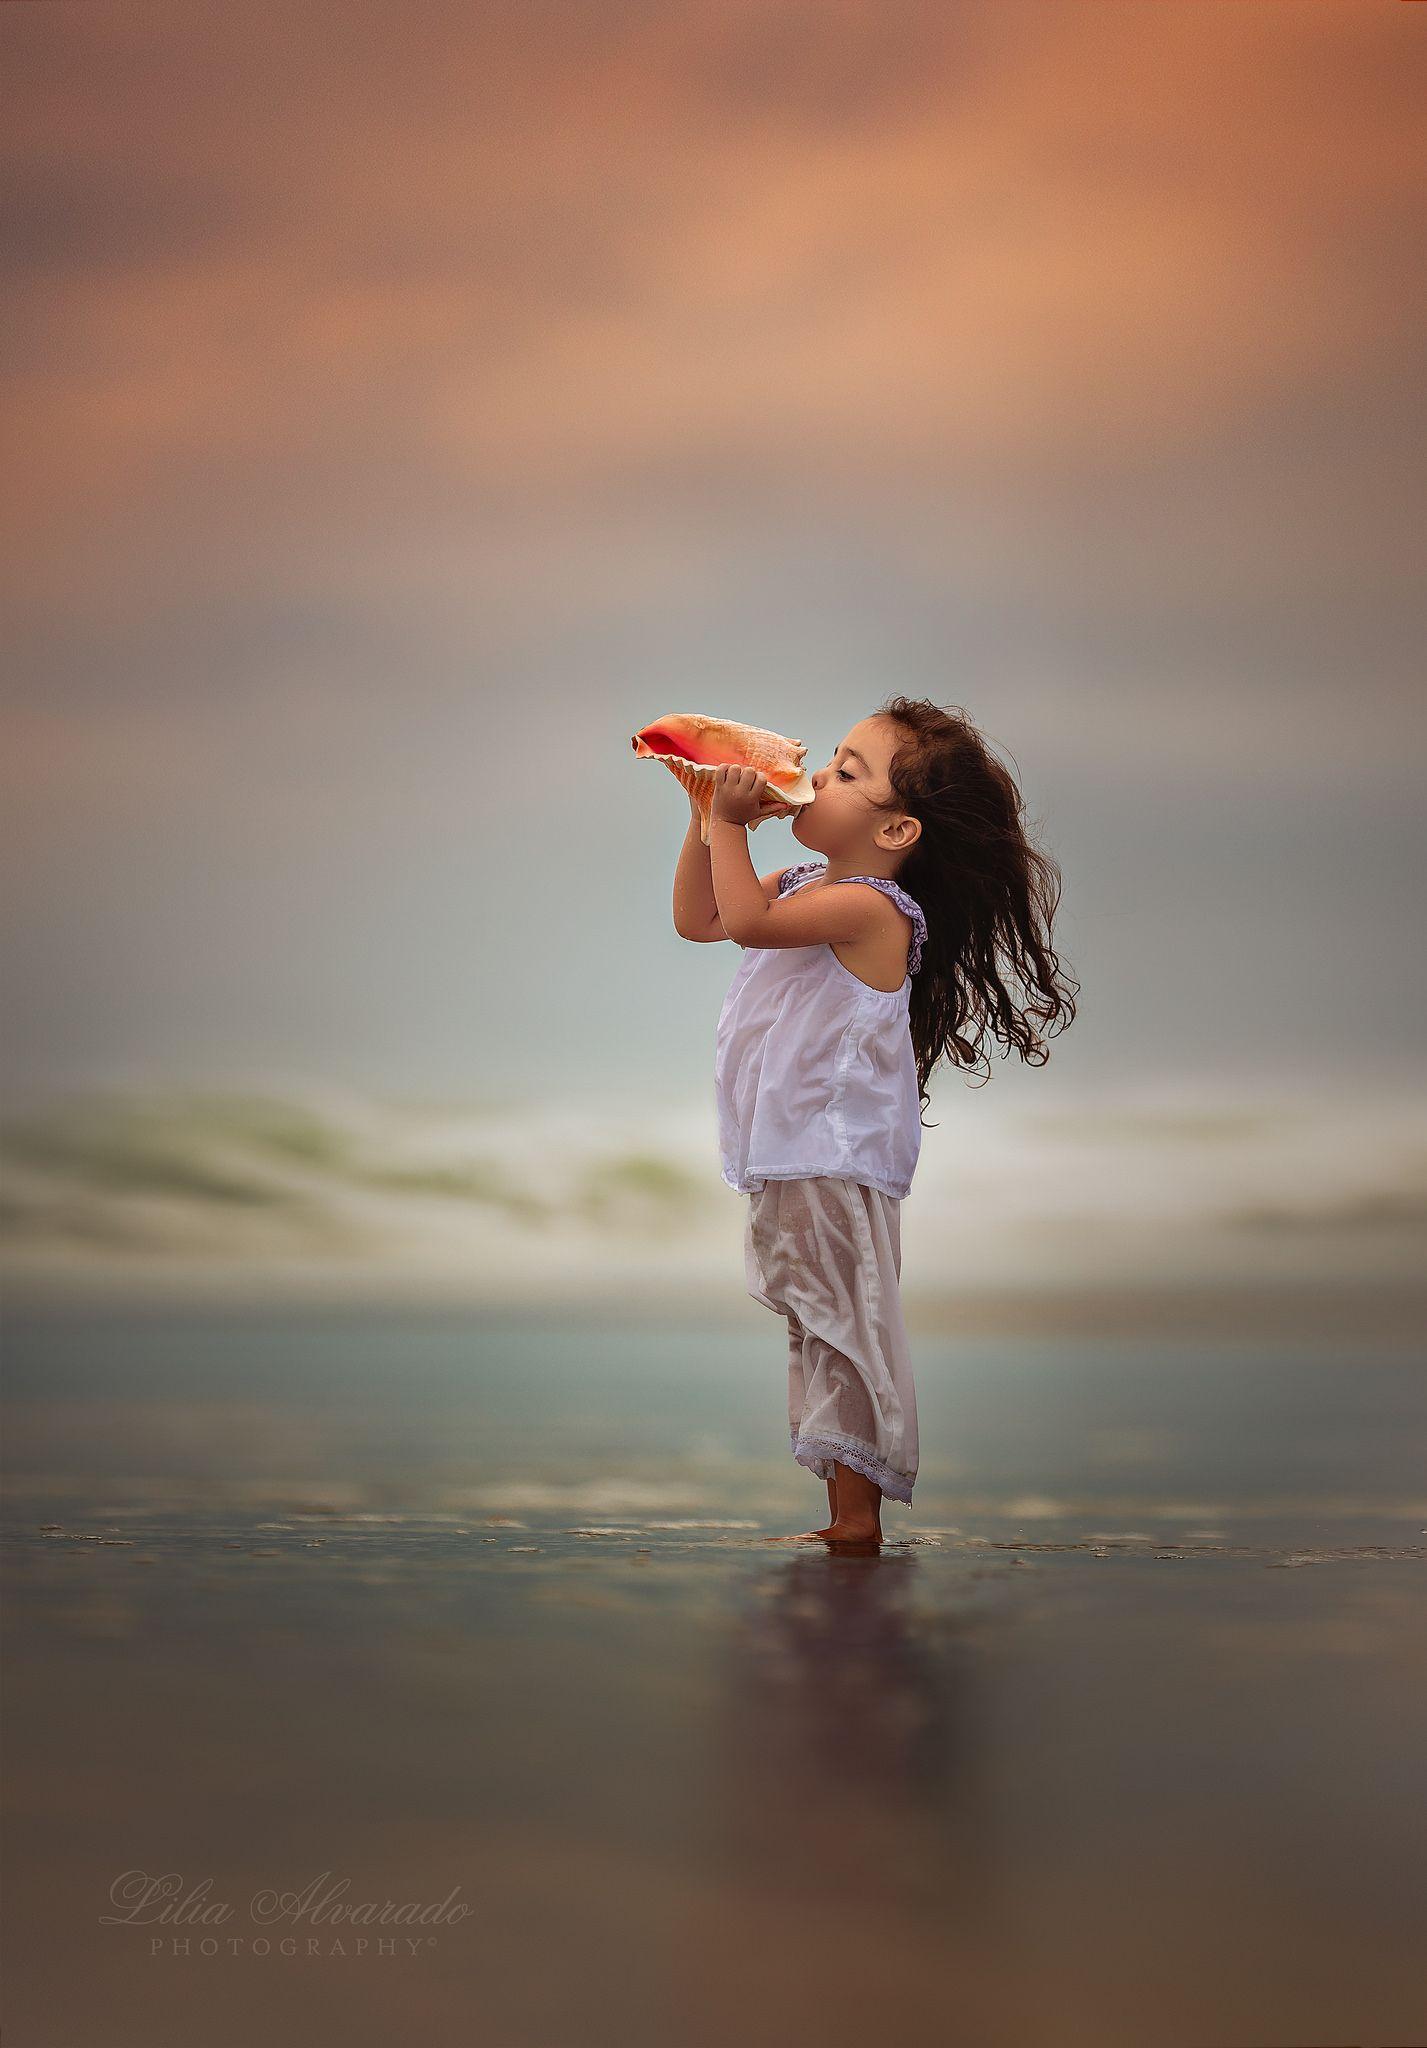 Beautiful Children profile pictures